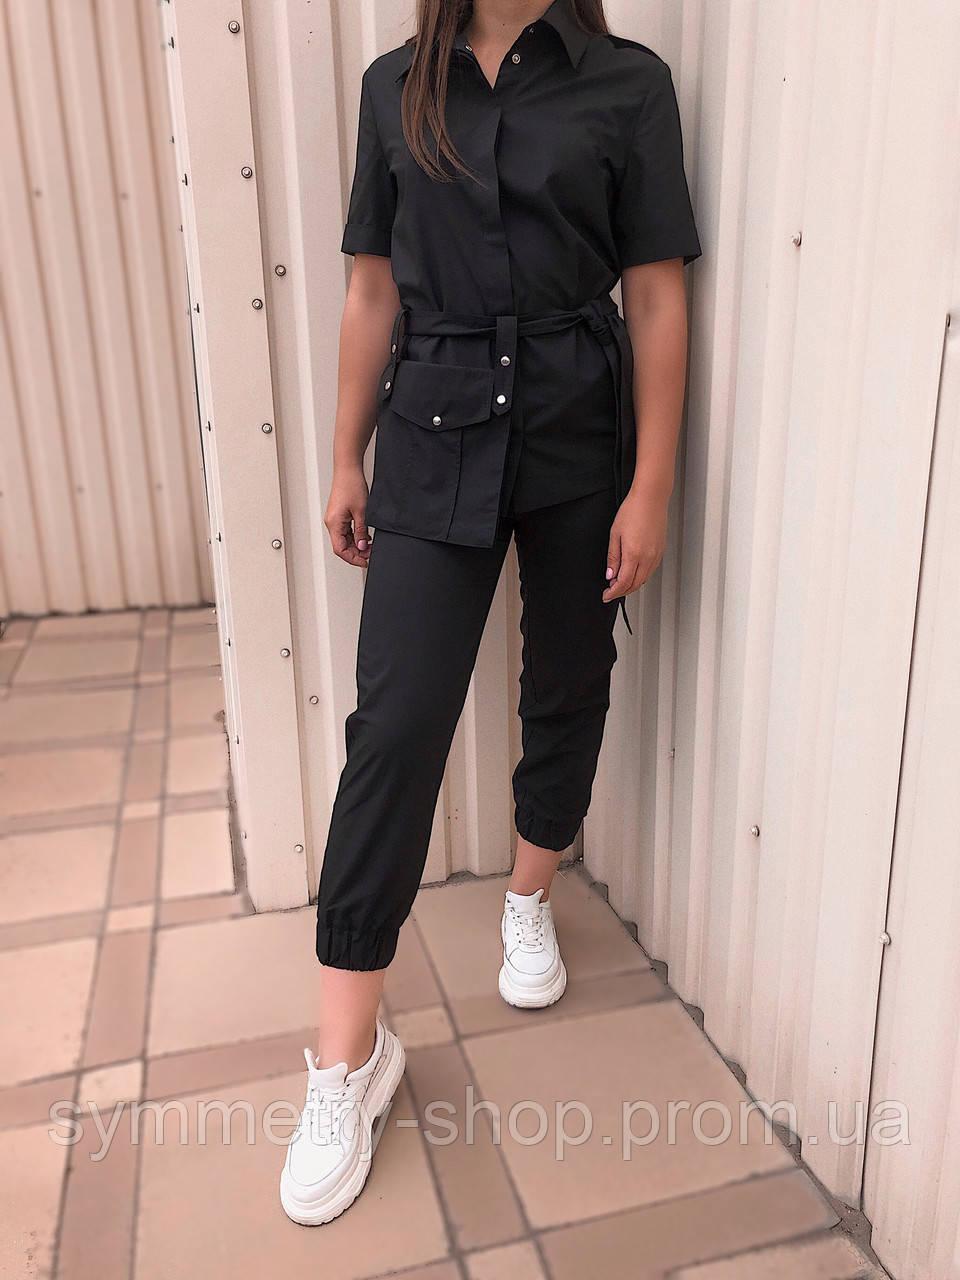 Жакет T011 со съемным карманом, чёрный